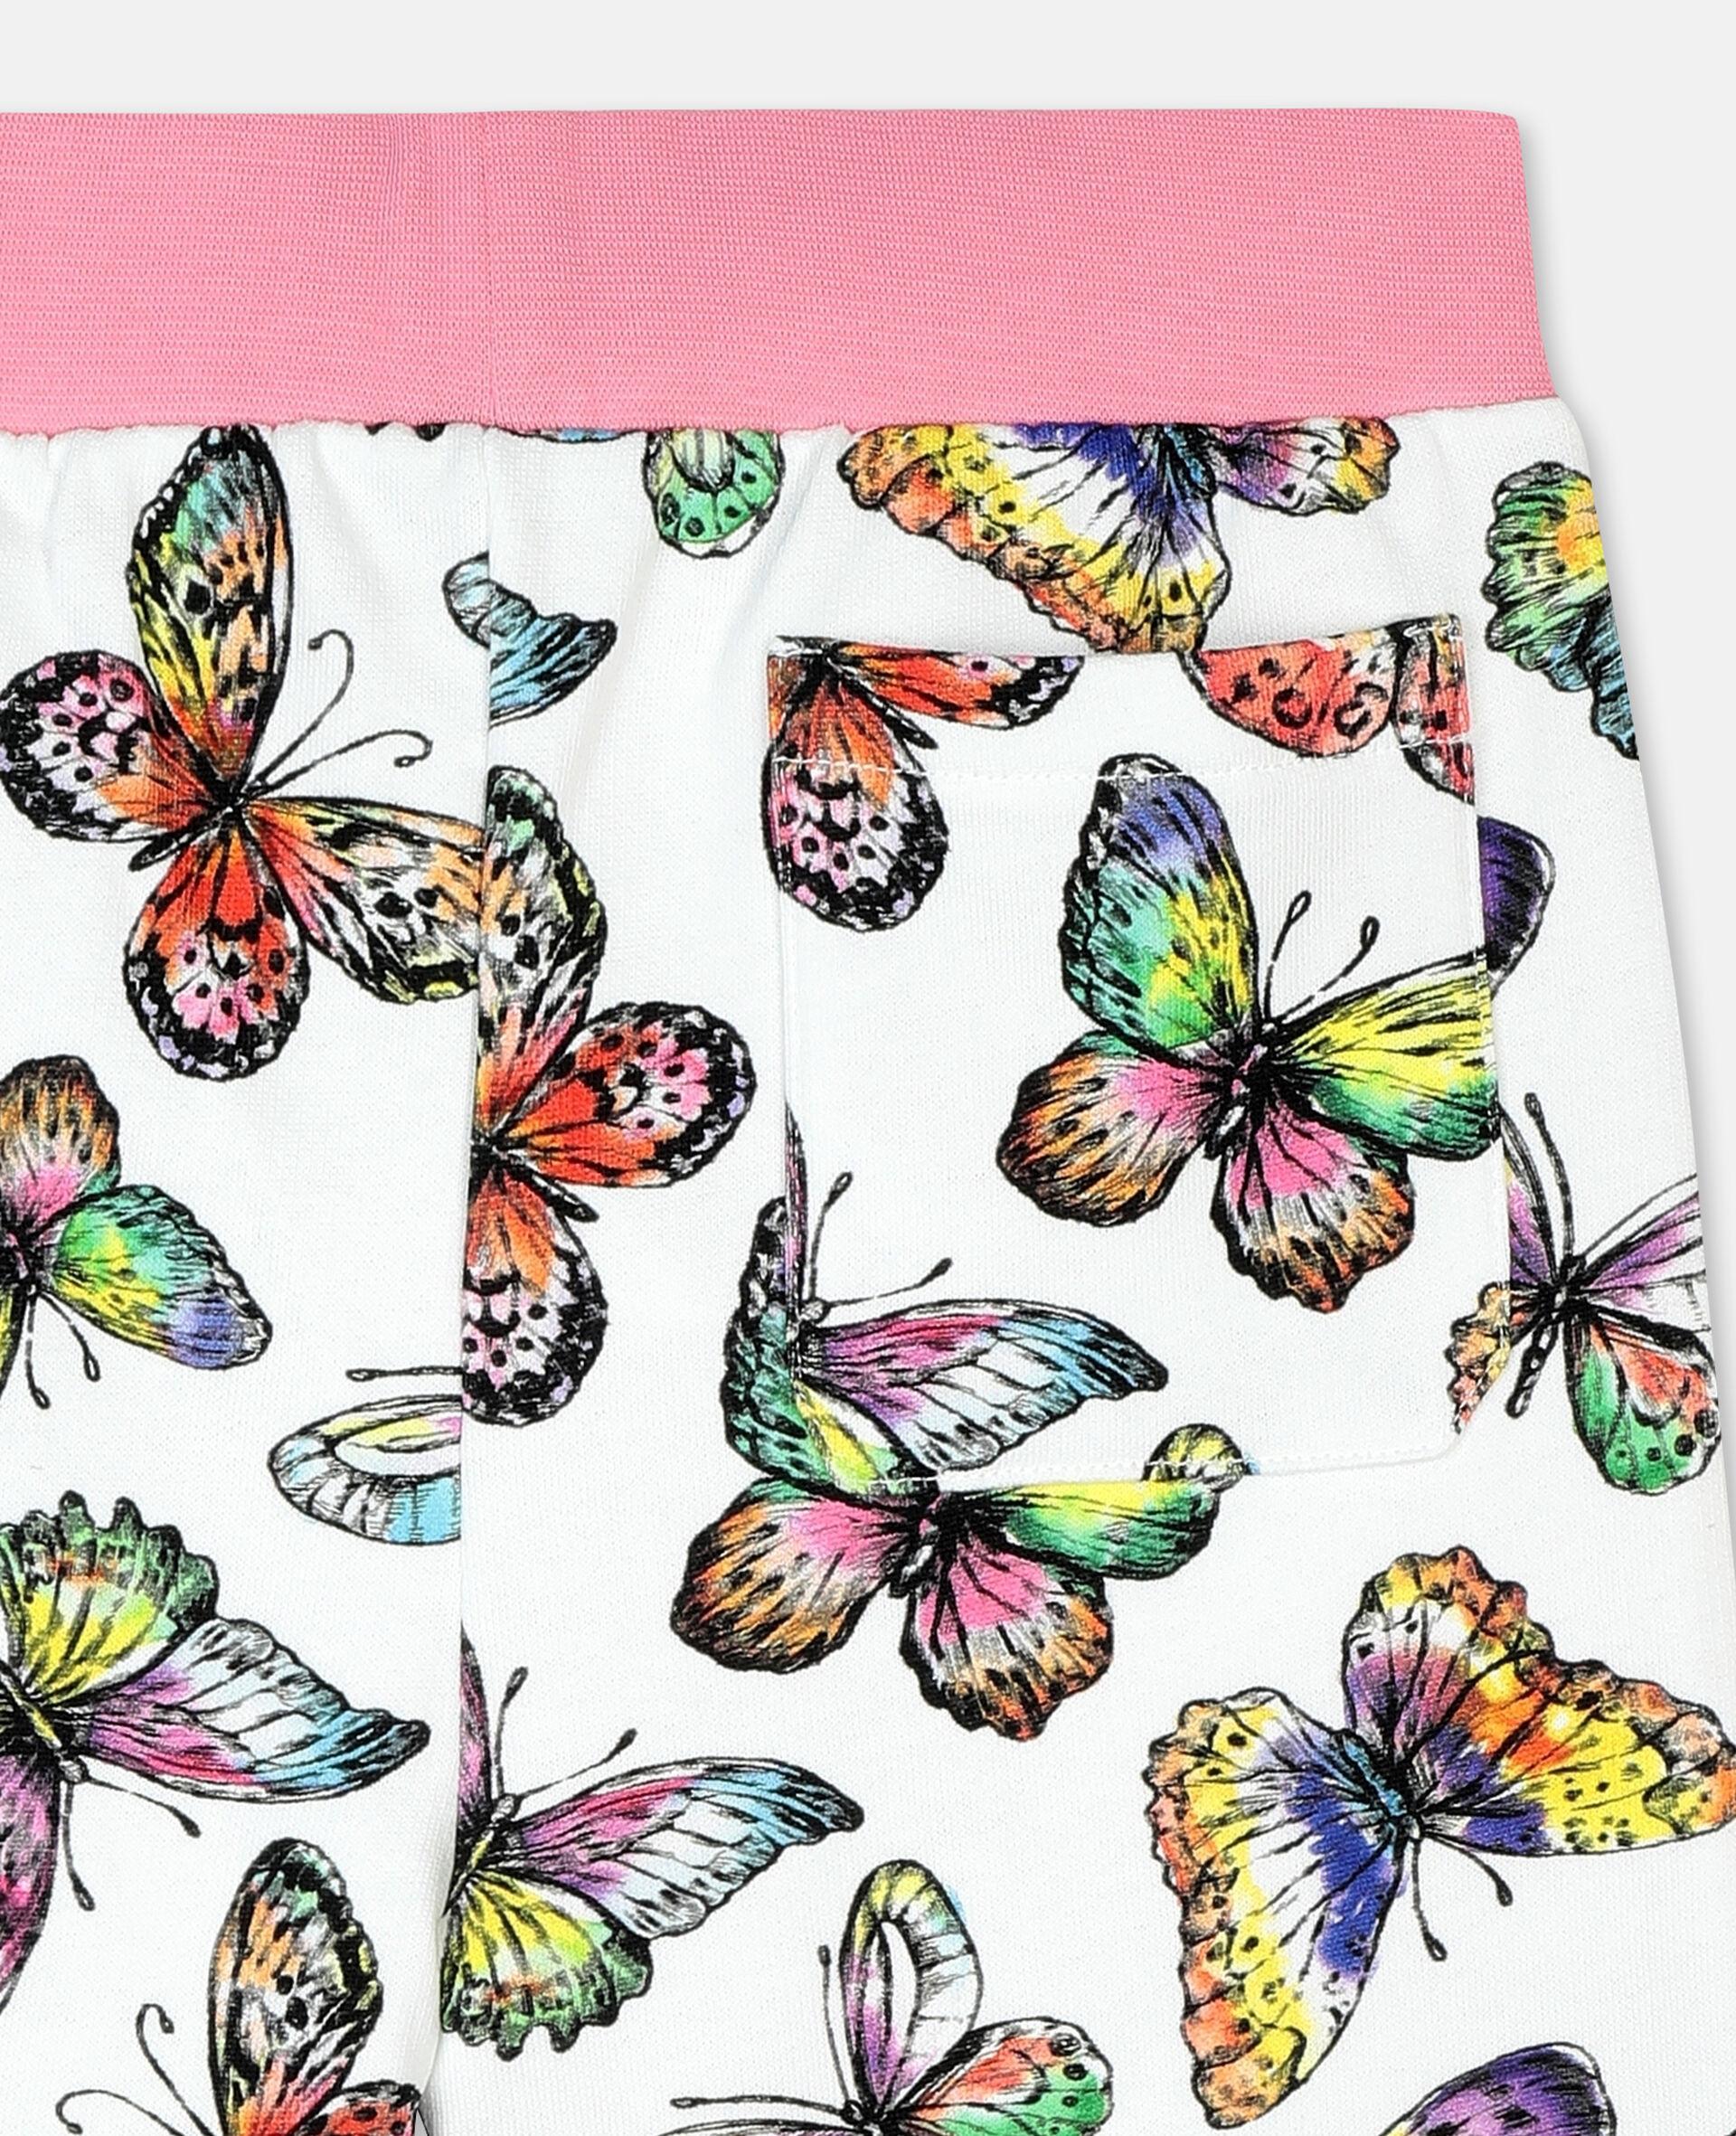 Jogginghose aus Baumwollfleece mit Schmetterlingen -Bunt-large image number 2